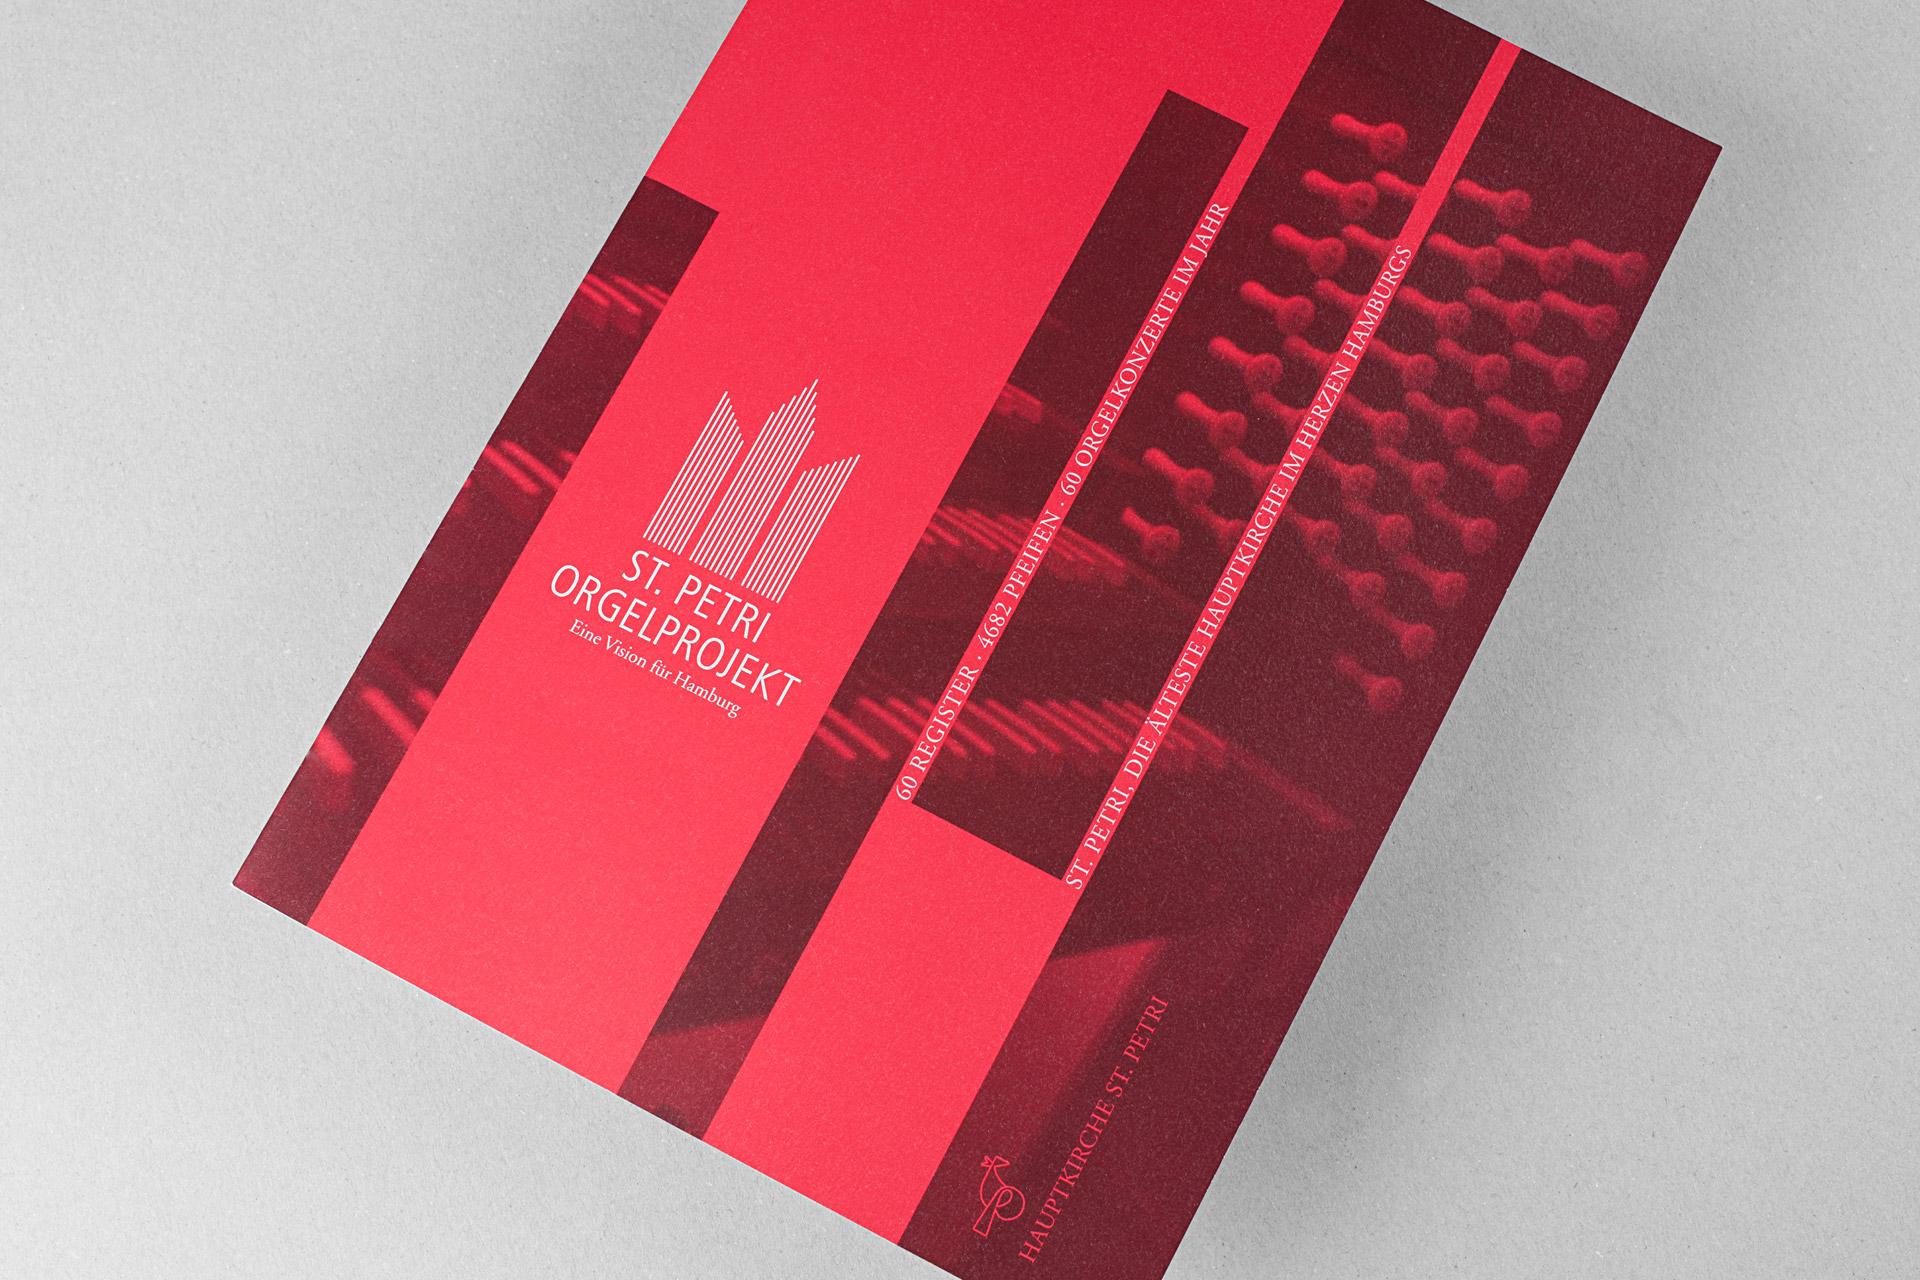 orgelprojekt-corporate-design cover